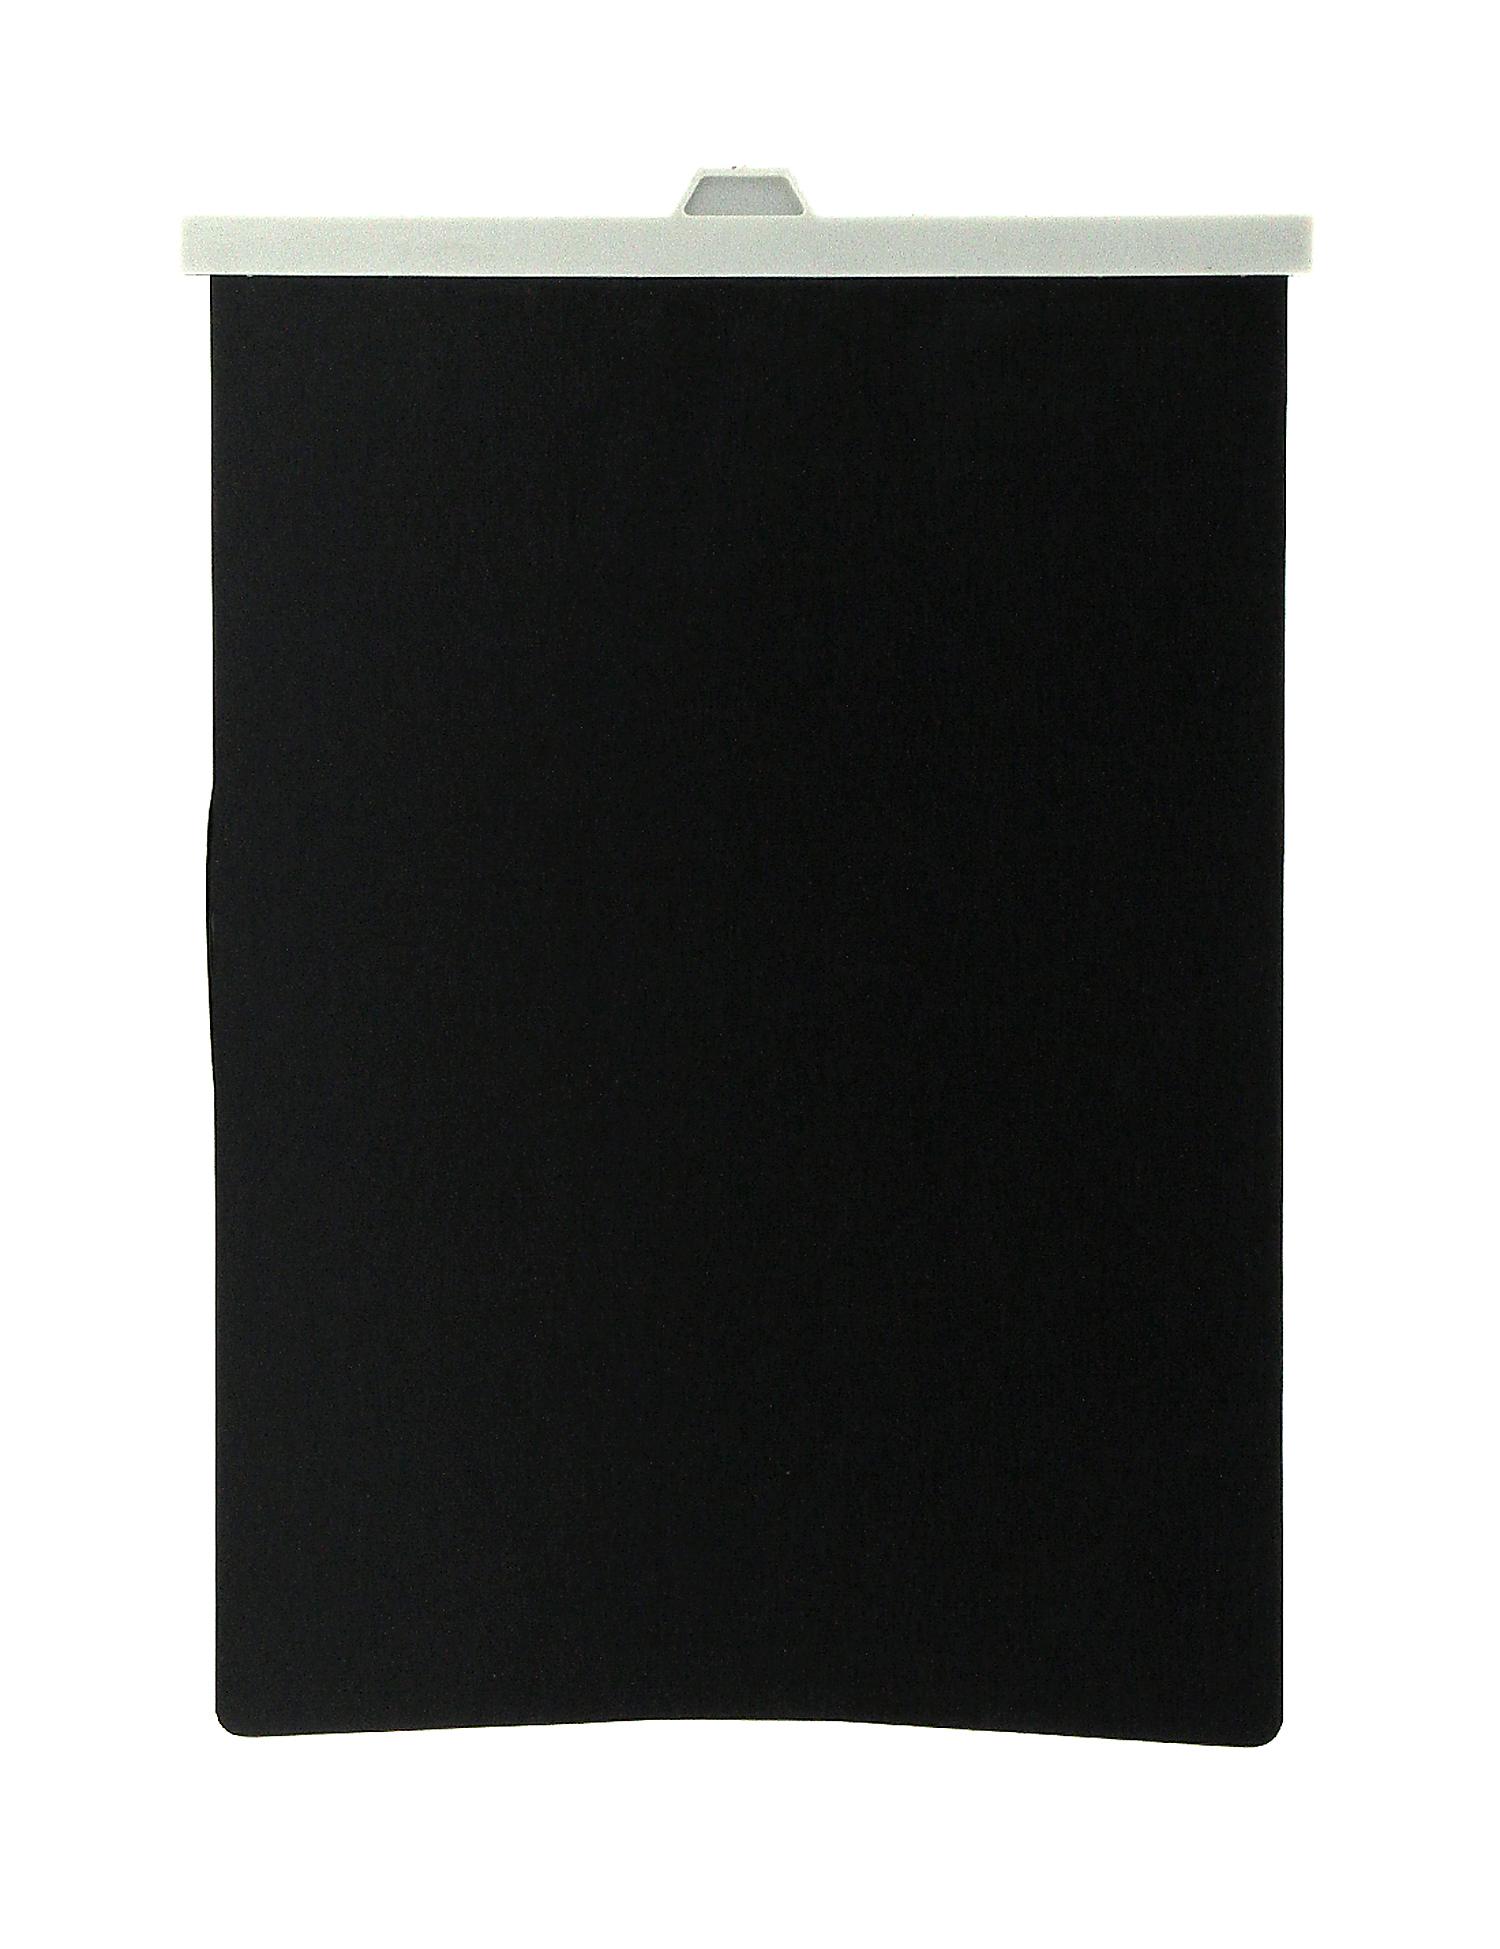 11 x 14 Dark Slide